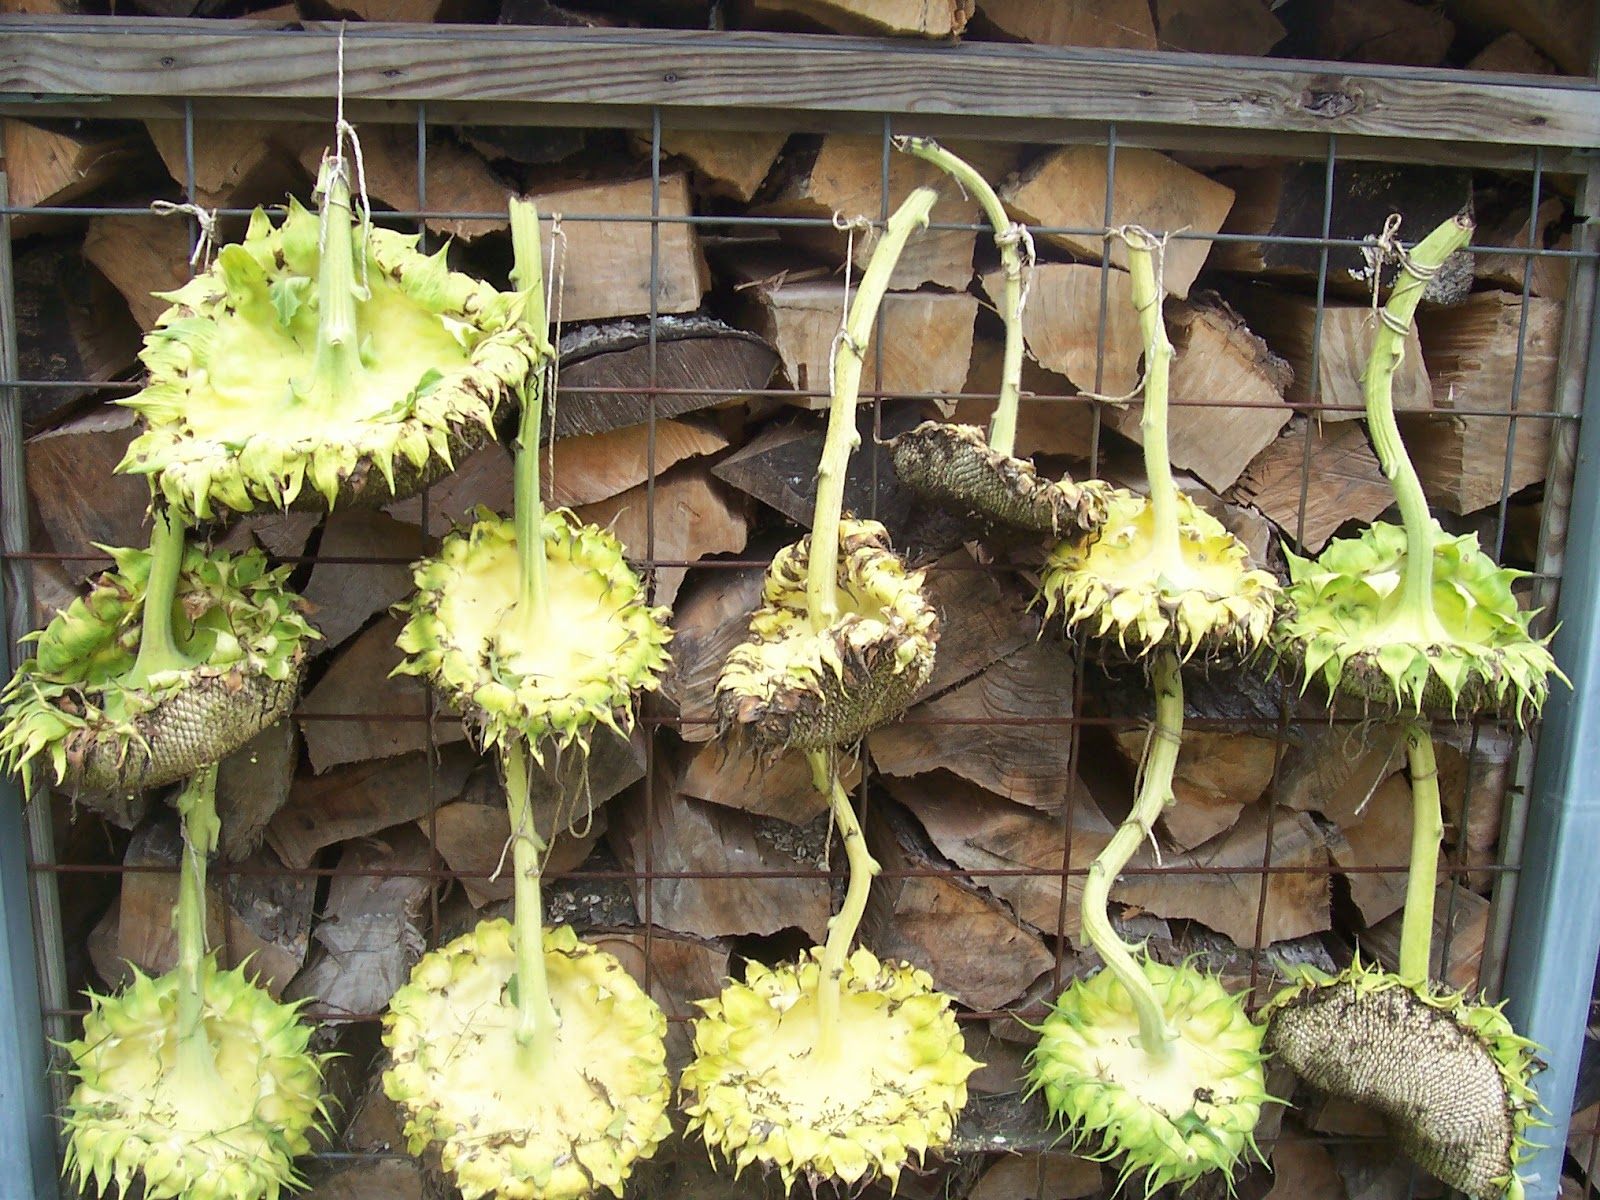 I Garden In Flip Flops When To Harvest Sunflowers-7213